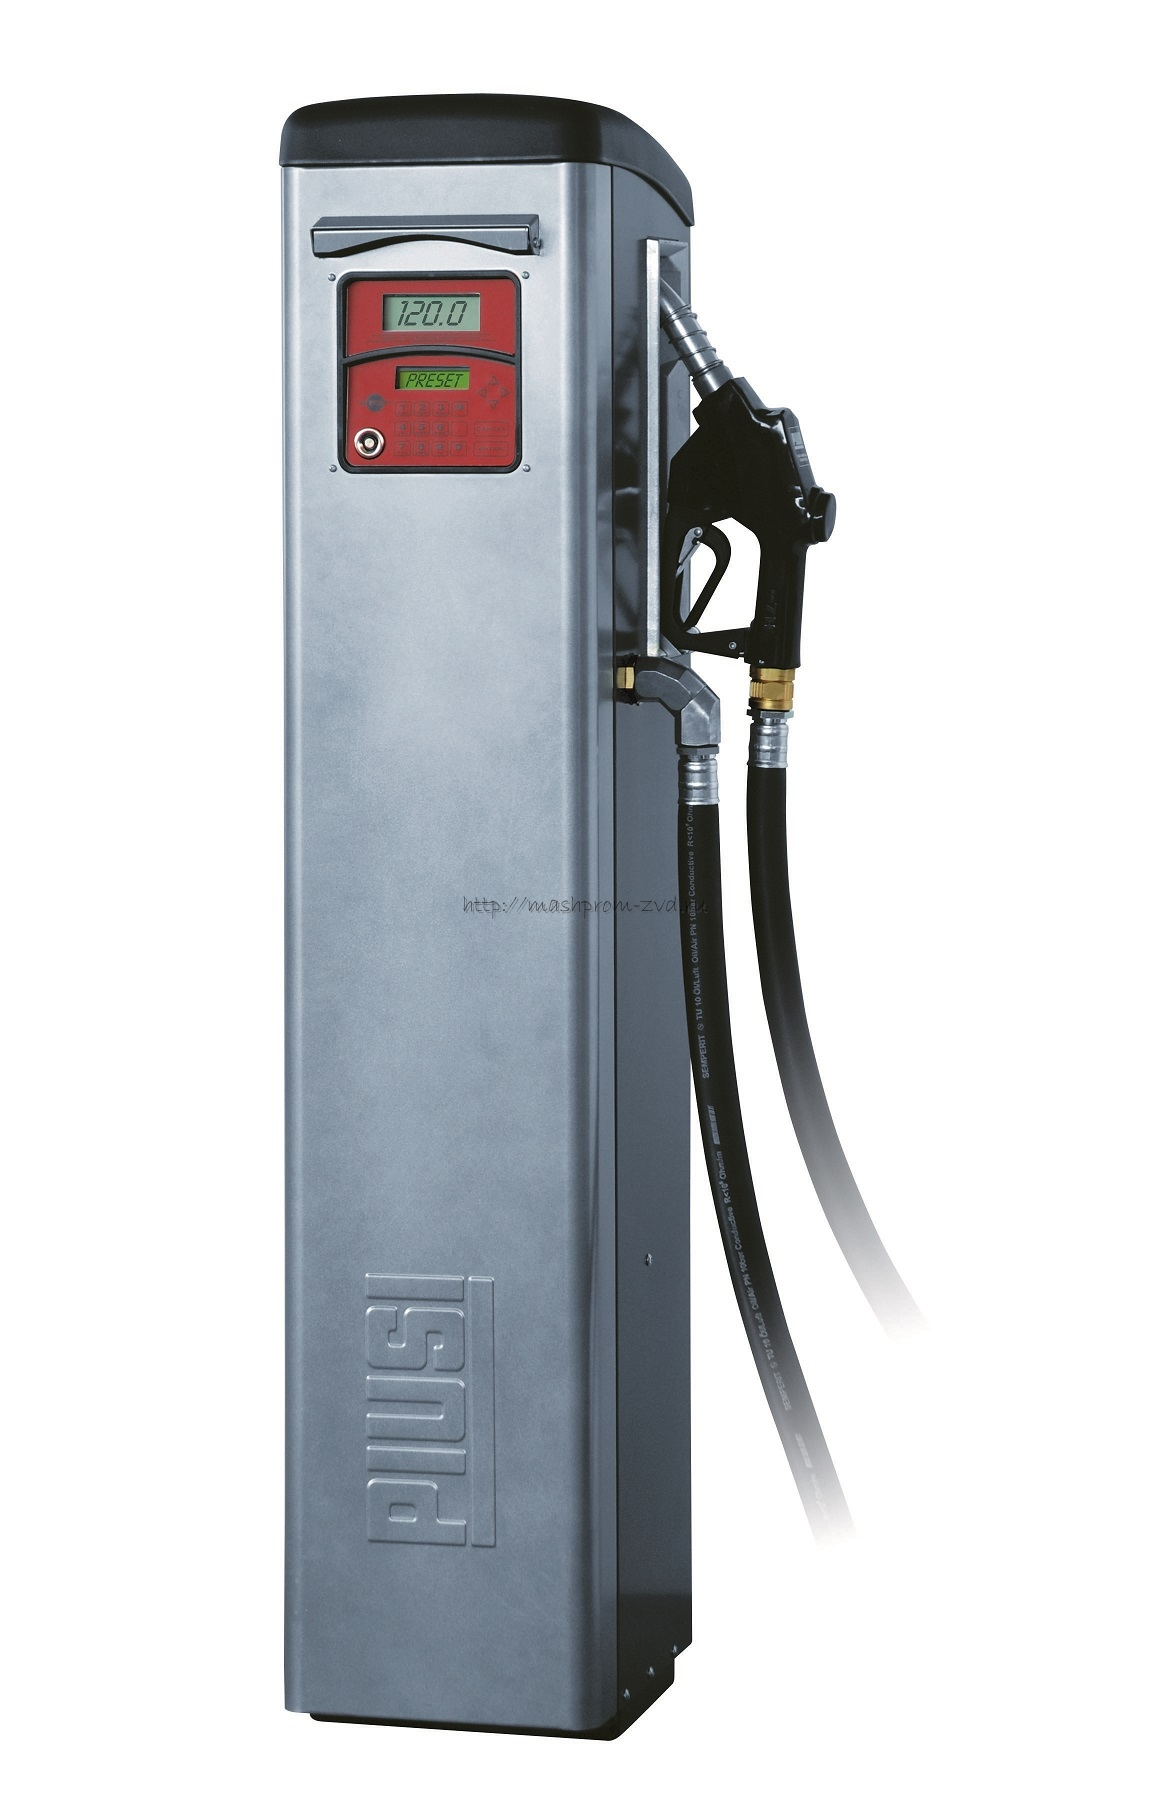 Self Service 70 MC F Printer арт. F0073806A - Стационарная топливораздаточная колонка для дизельного топлива